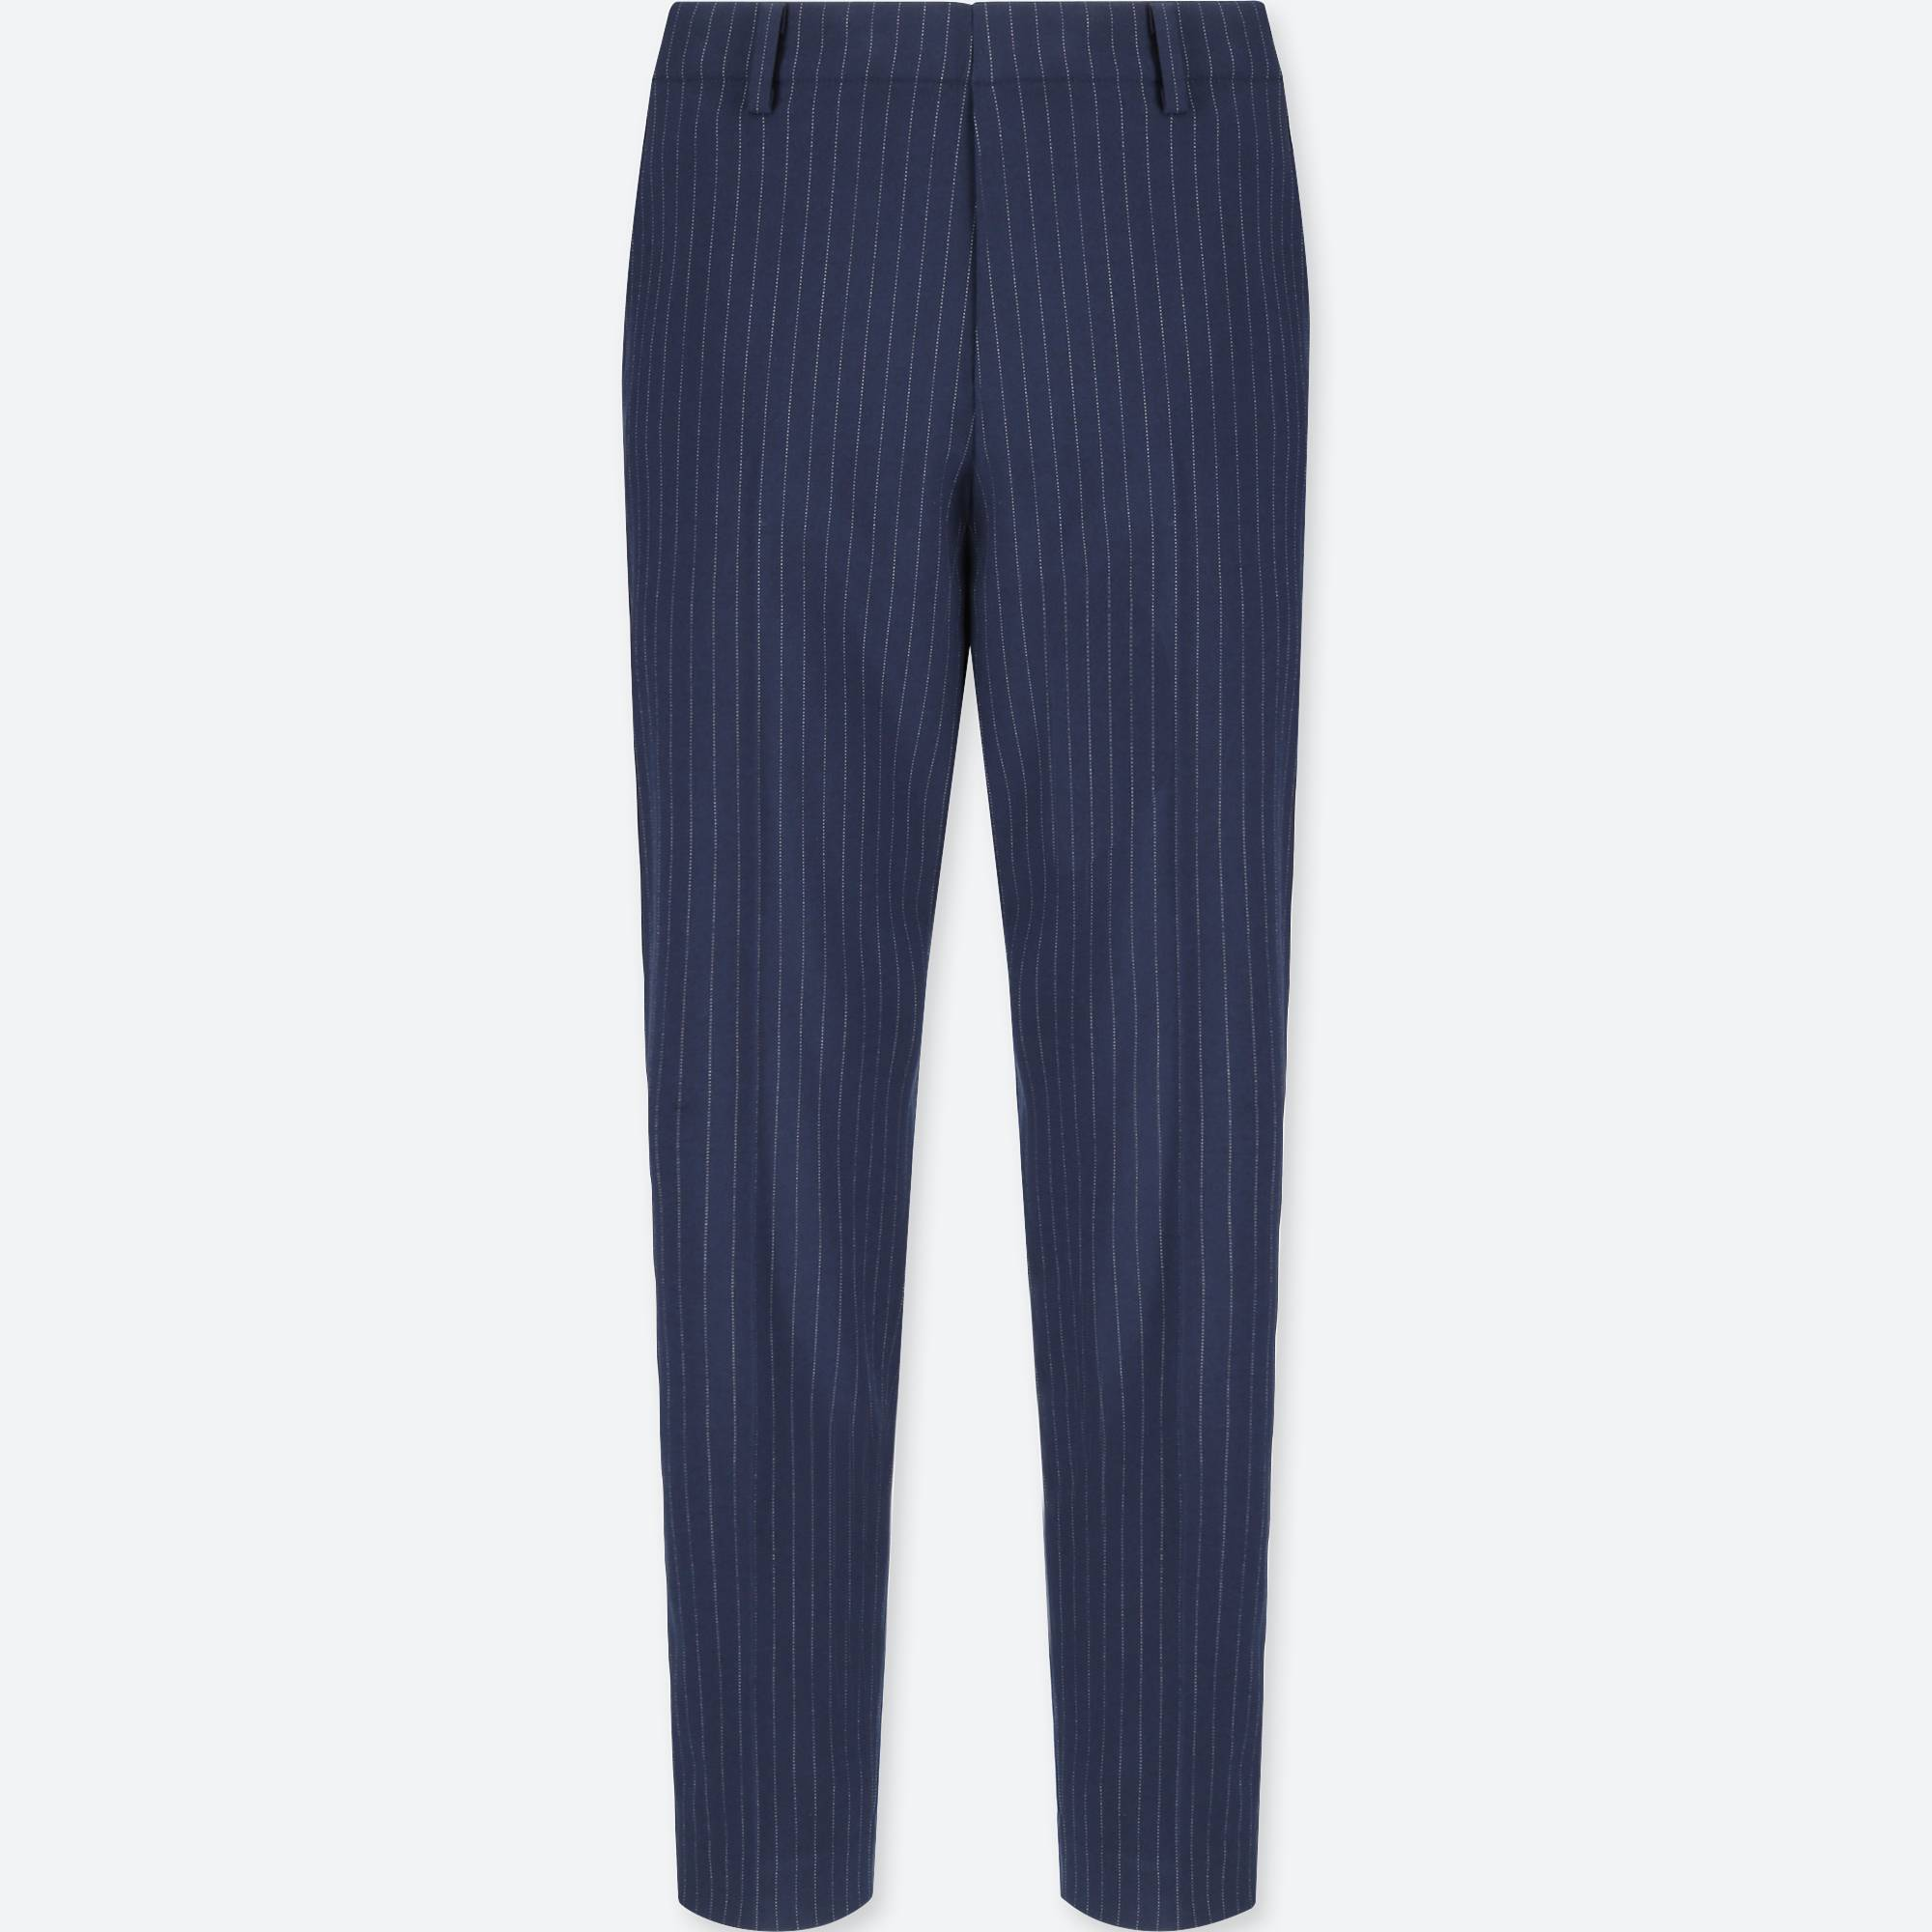 Women Smart Style Ankle Length Pants